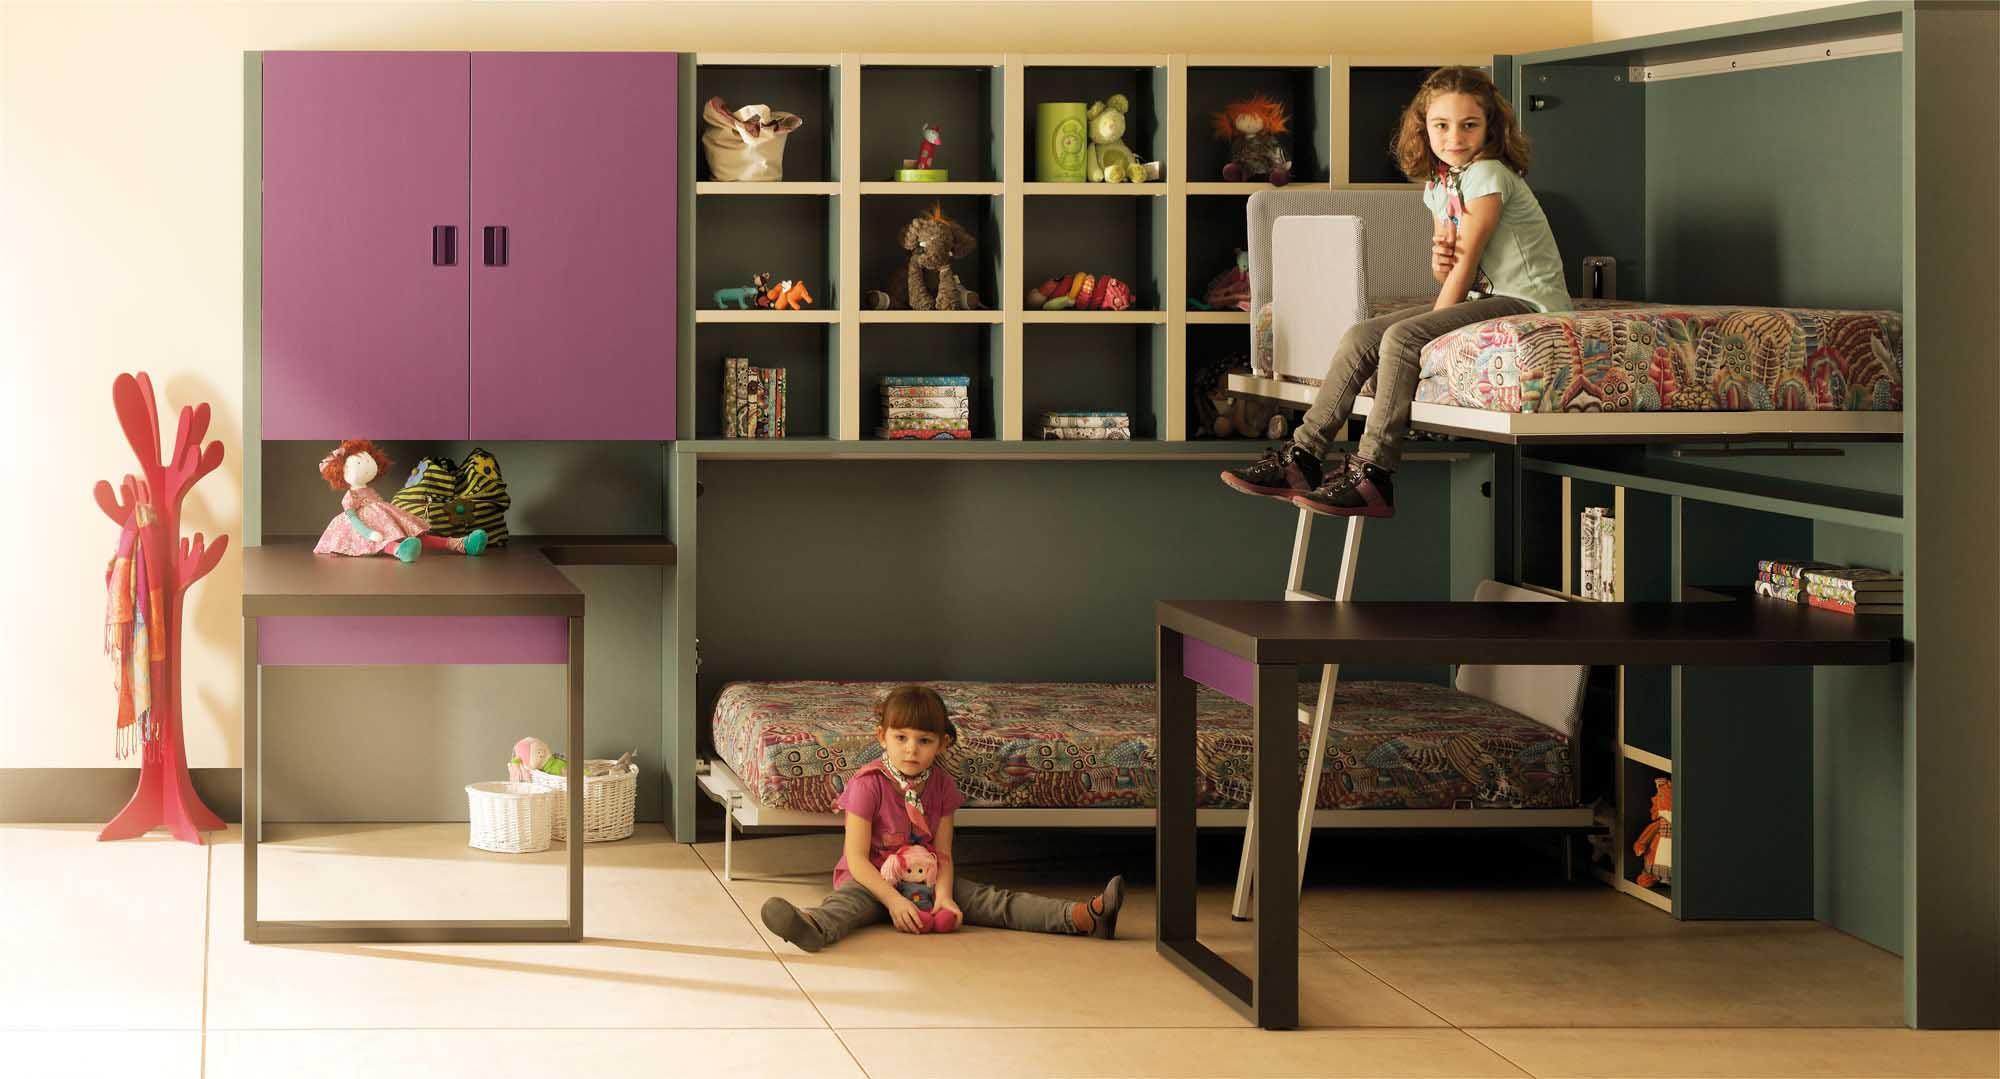 Life box de lagrama dormir estudiar jugar byhome - Dormitorios dos camas ikea ...